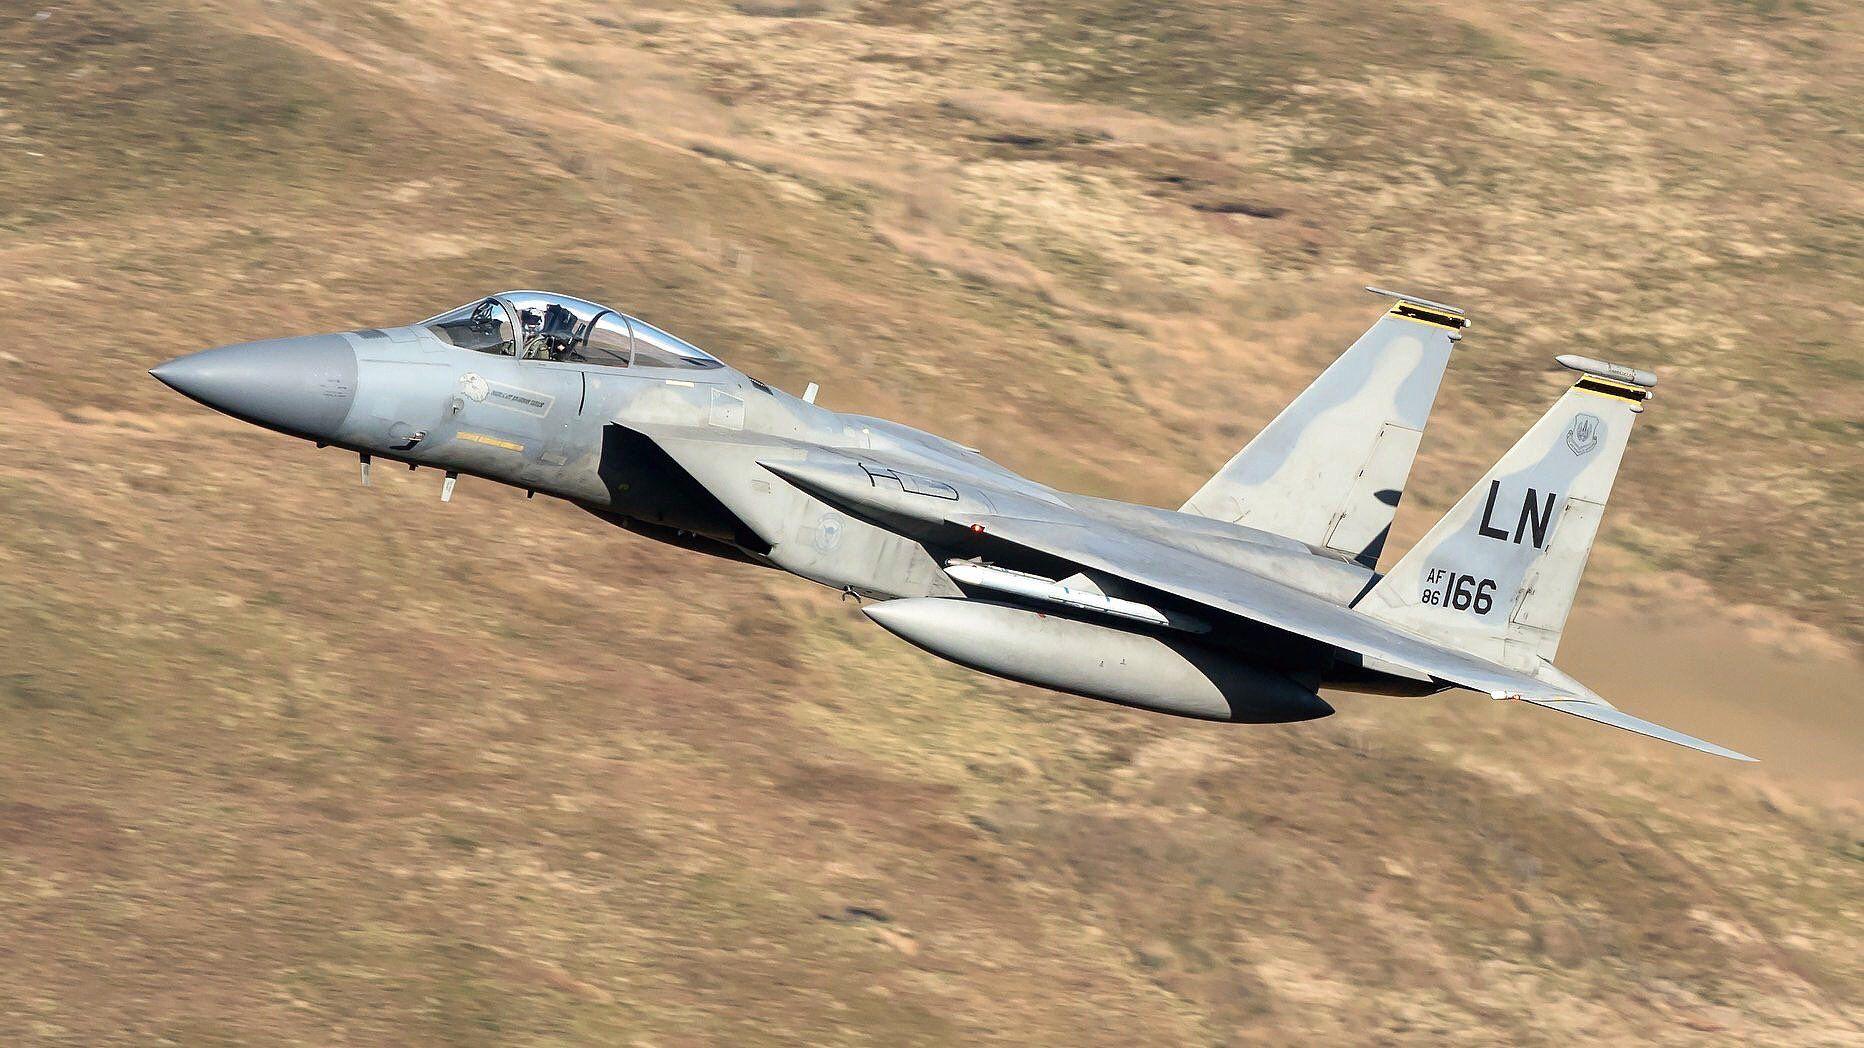 Pin by John Yuska on Aircraft Fighter jets, Military